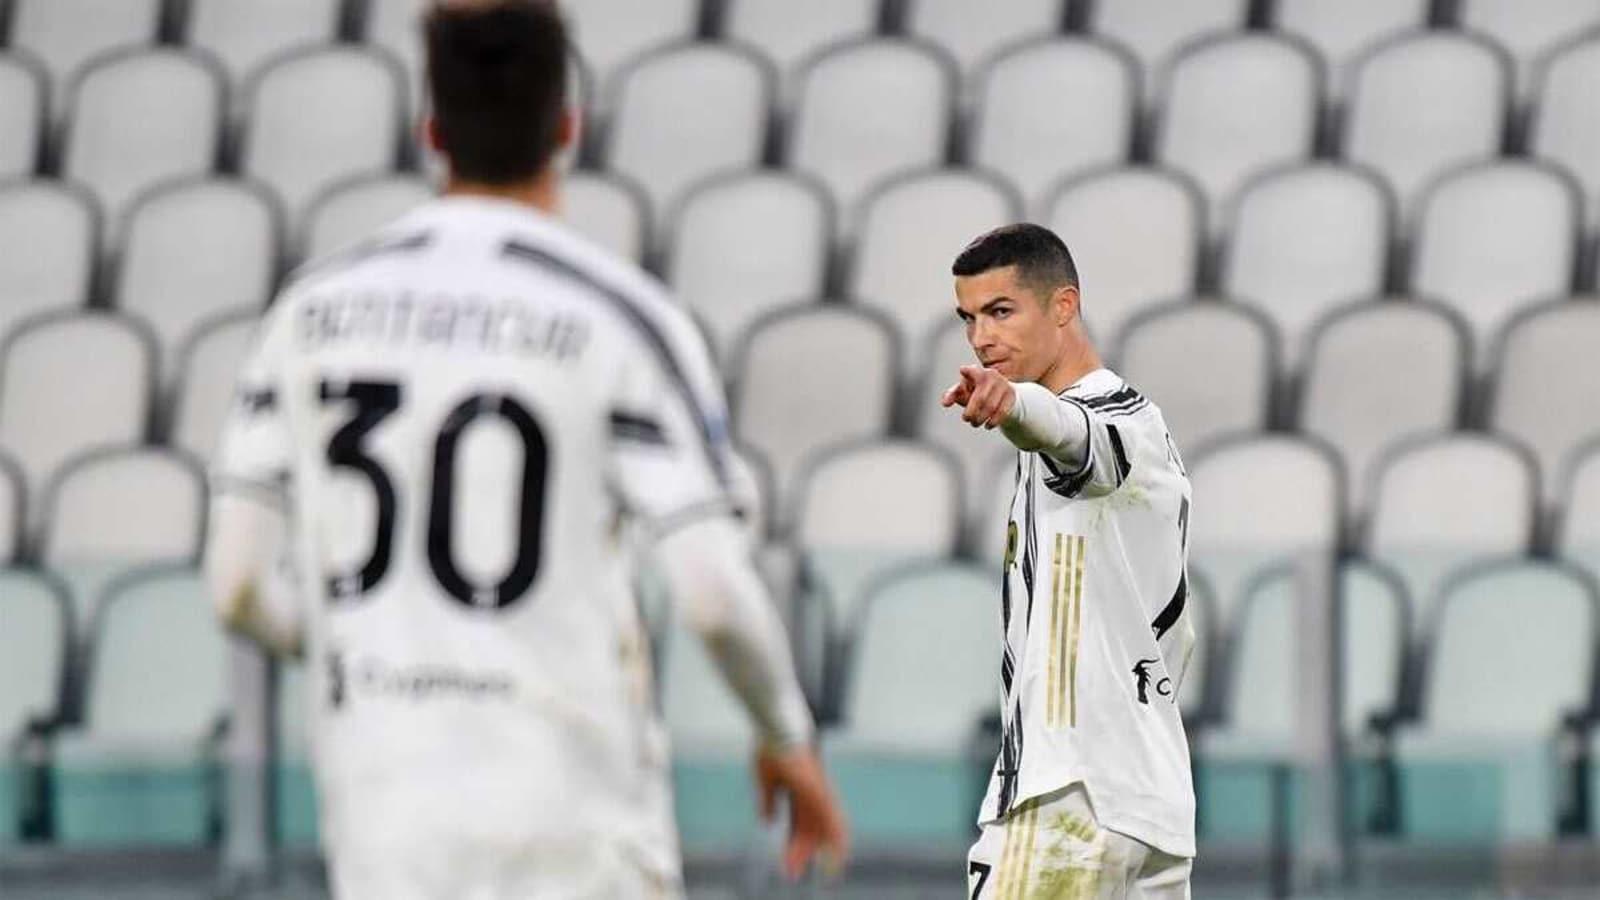 Ronaldo marks 600th league game with landmark goal as Juventus beat Spezia  | Hindustan Times